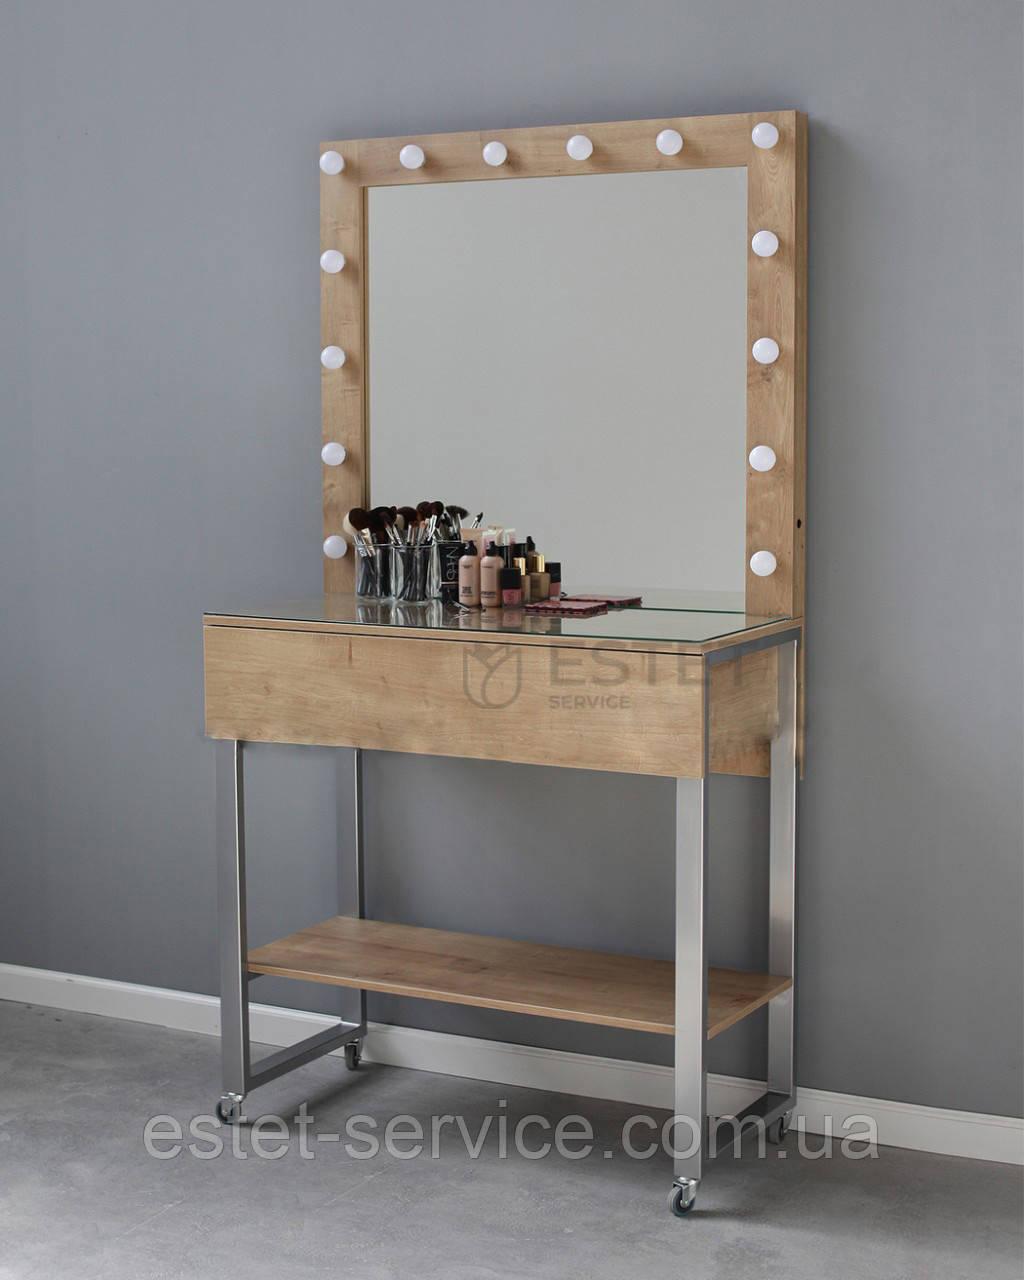 Место визажиста с металлическими ножками и зеркалом в раме